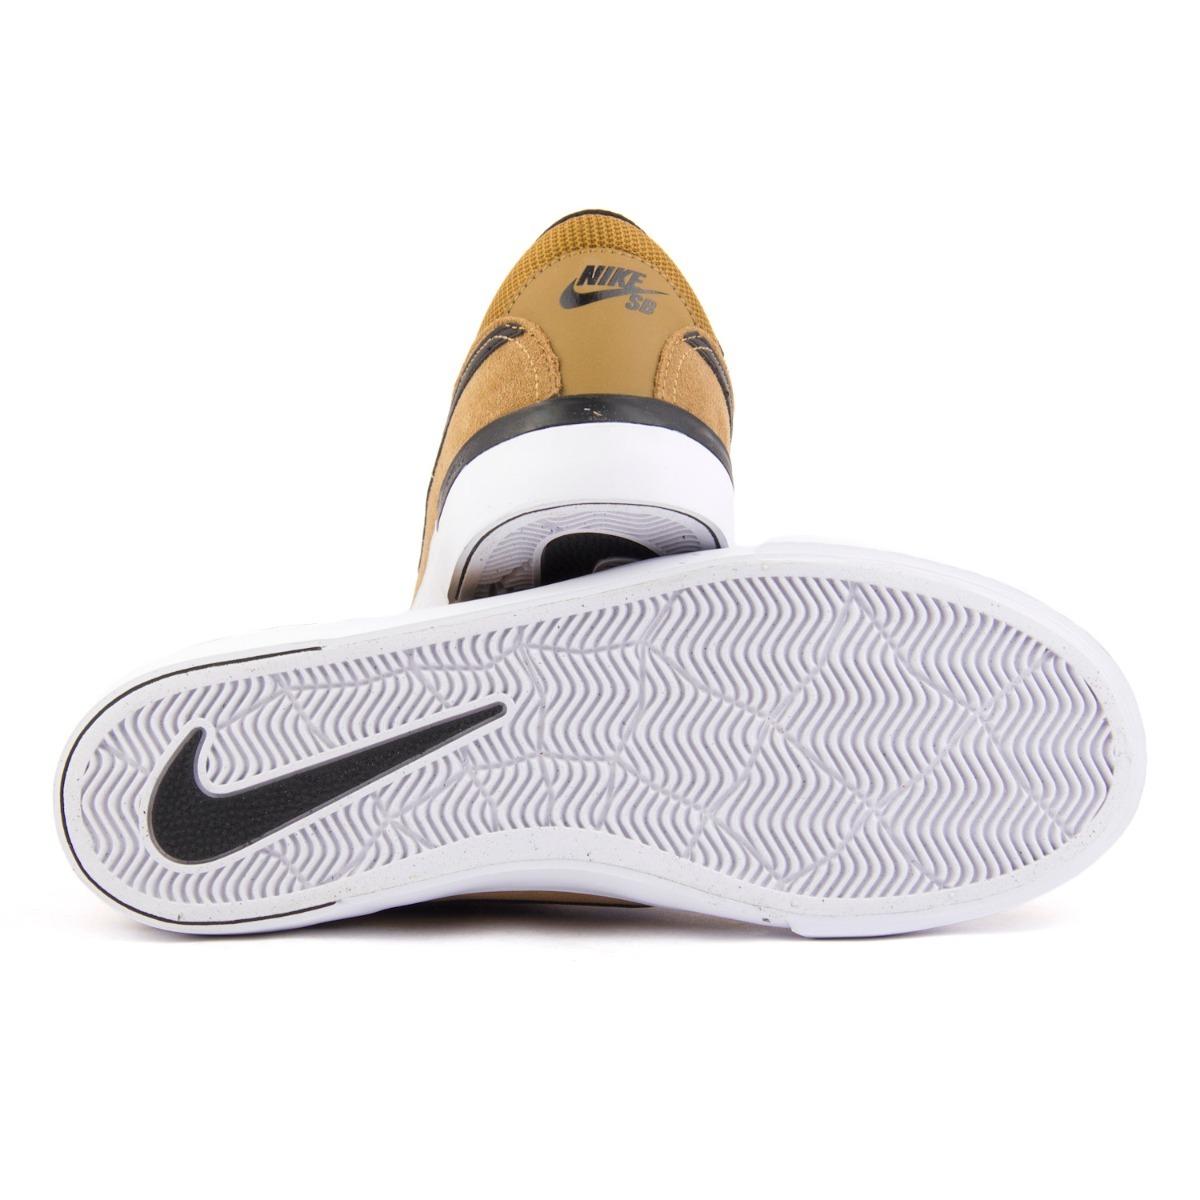 buy online a8a25 f0471 zapatillas nike sb eric koston hiperfeel unisex golden 200. Cargando zoom.